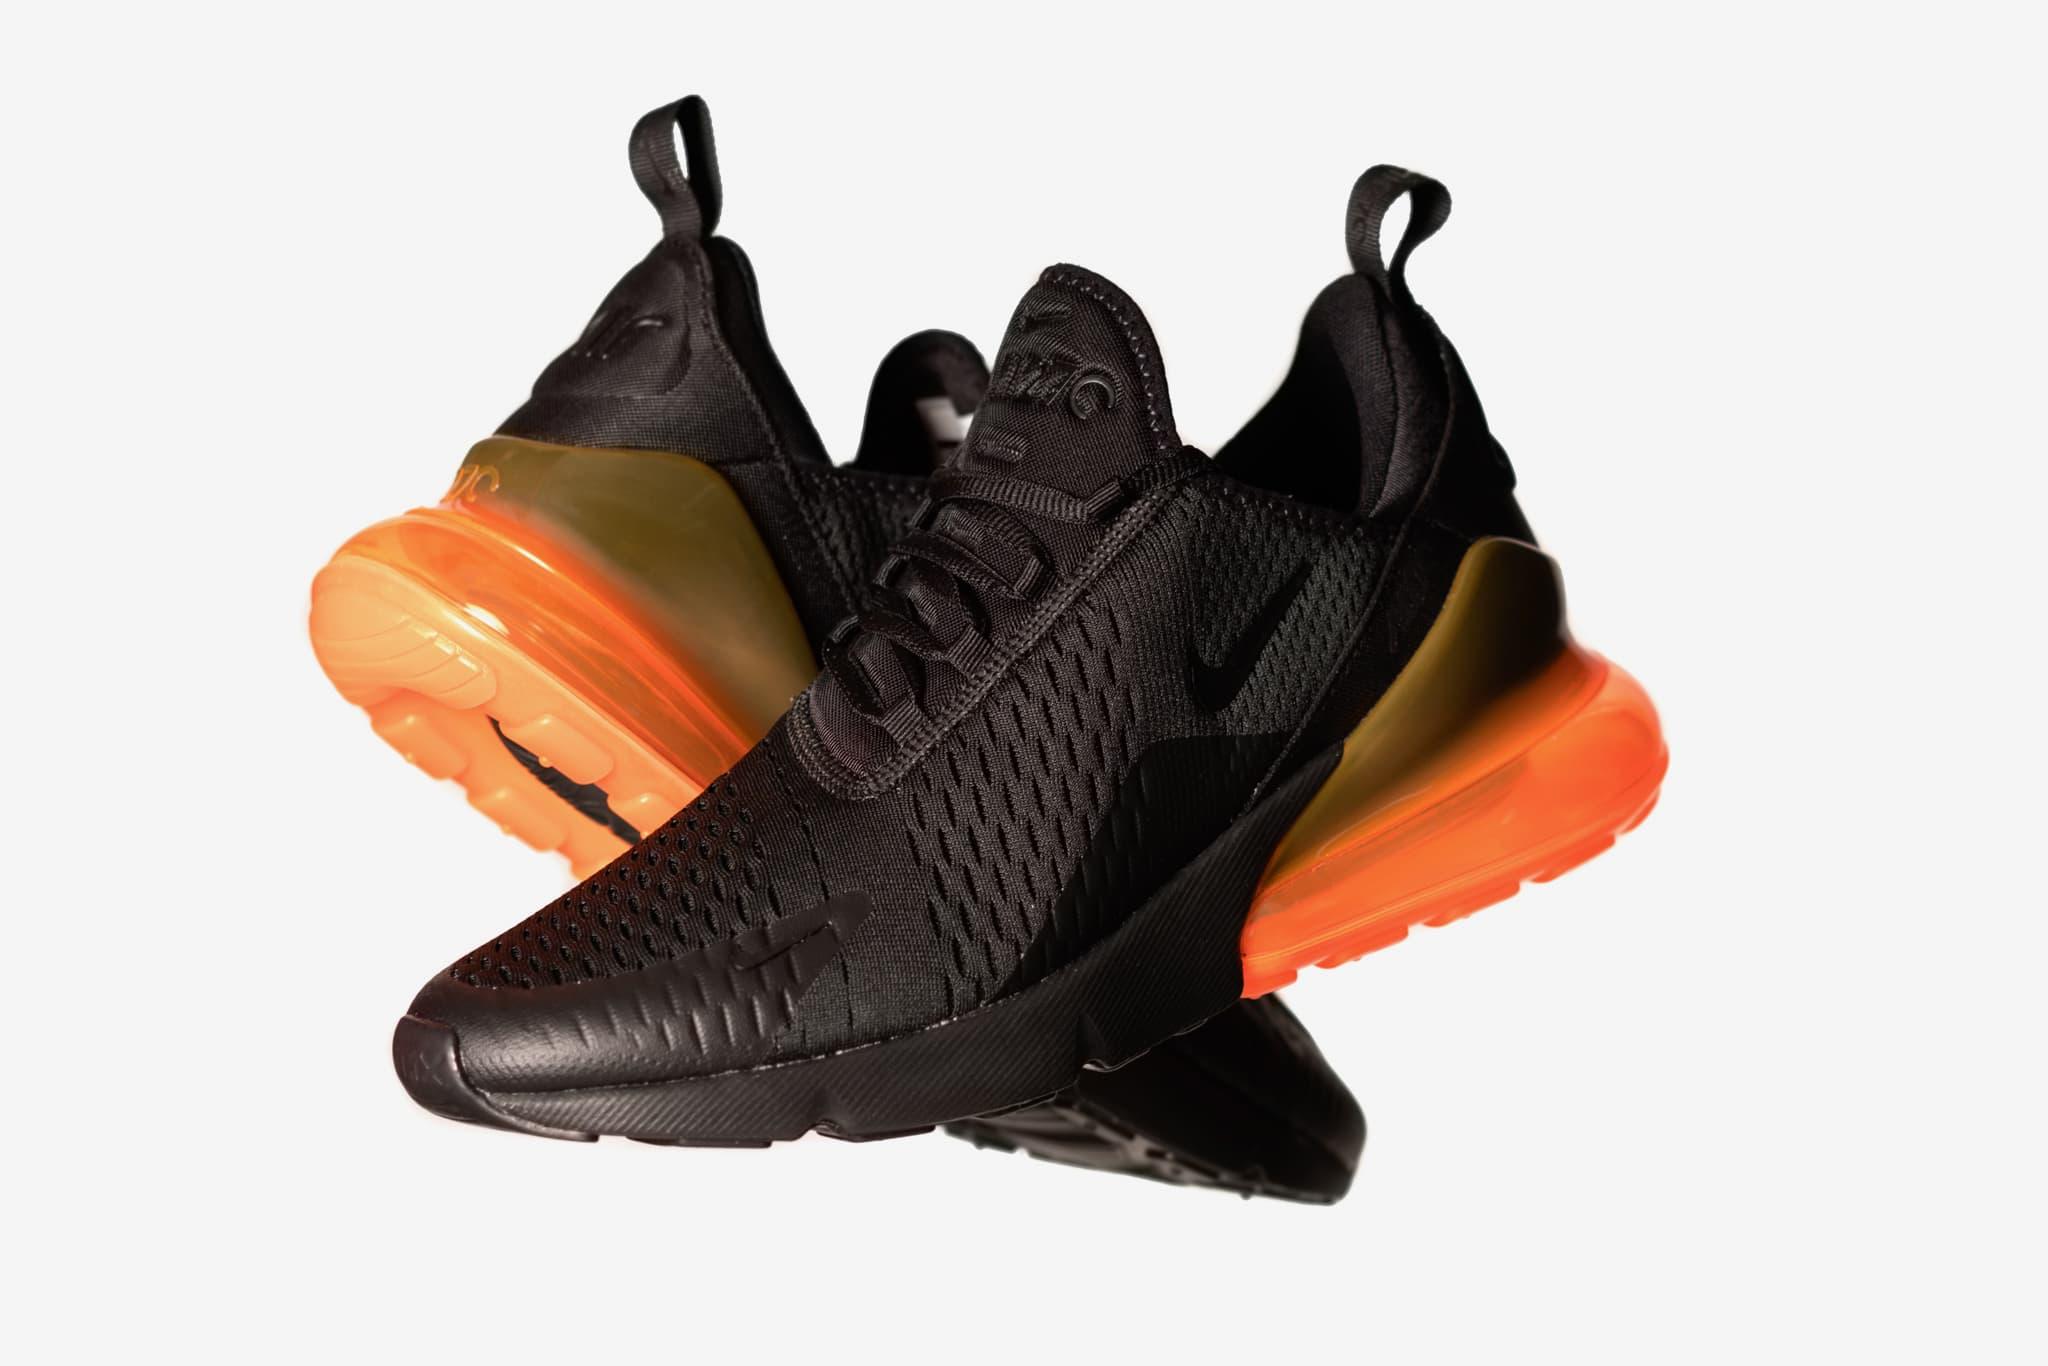 wholesale dealer 764a6 a7b7f ... 93 light stone maple-loden rochcl erabl-loden 306551 121 sz  Nike Air  Max 270 Black Orange Now Available ...